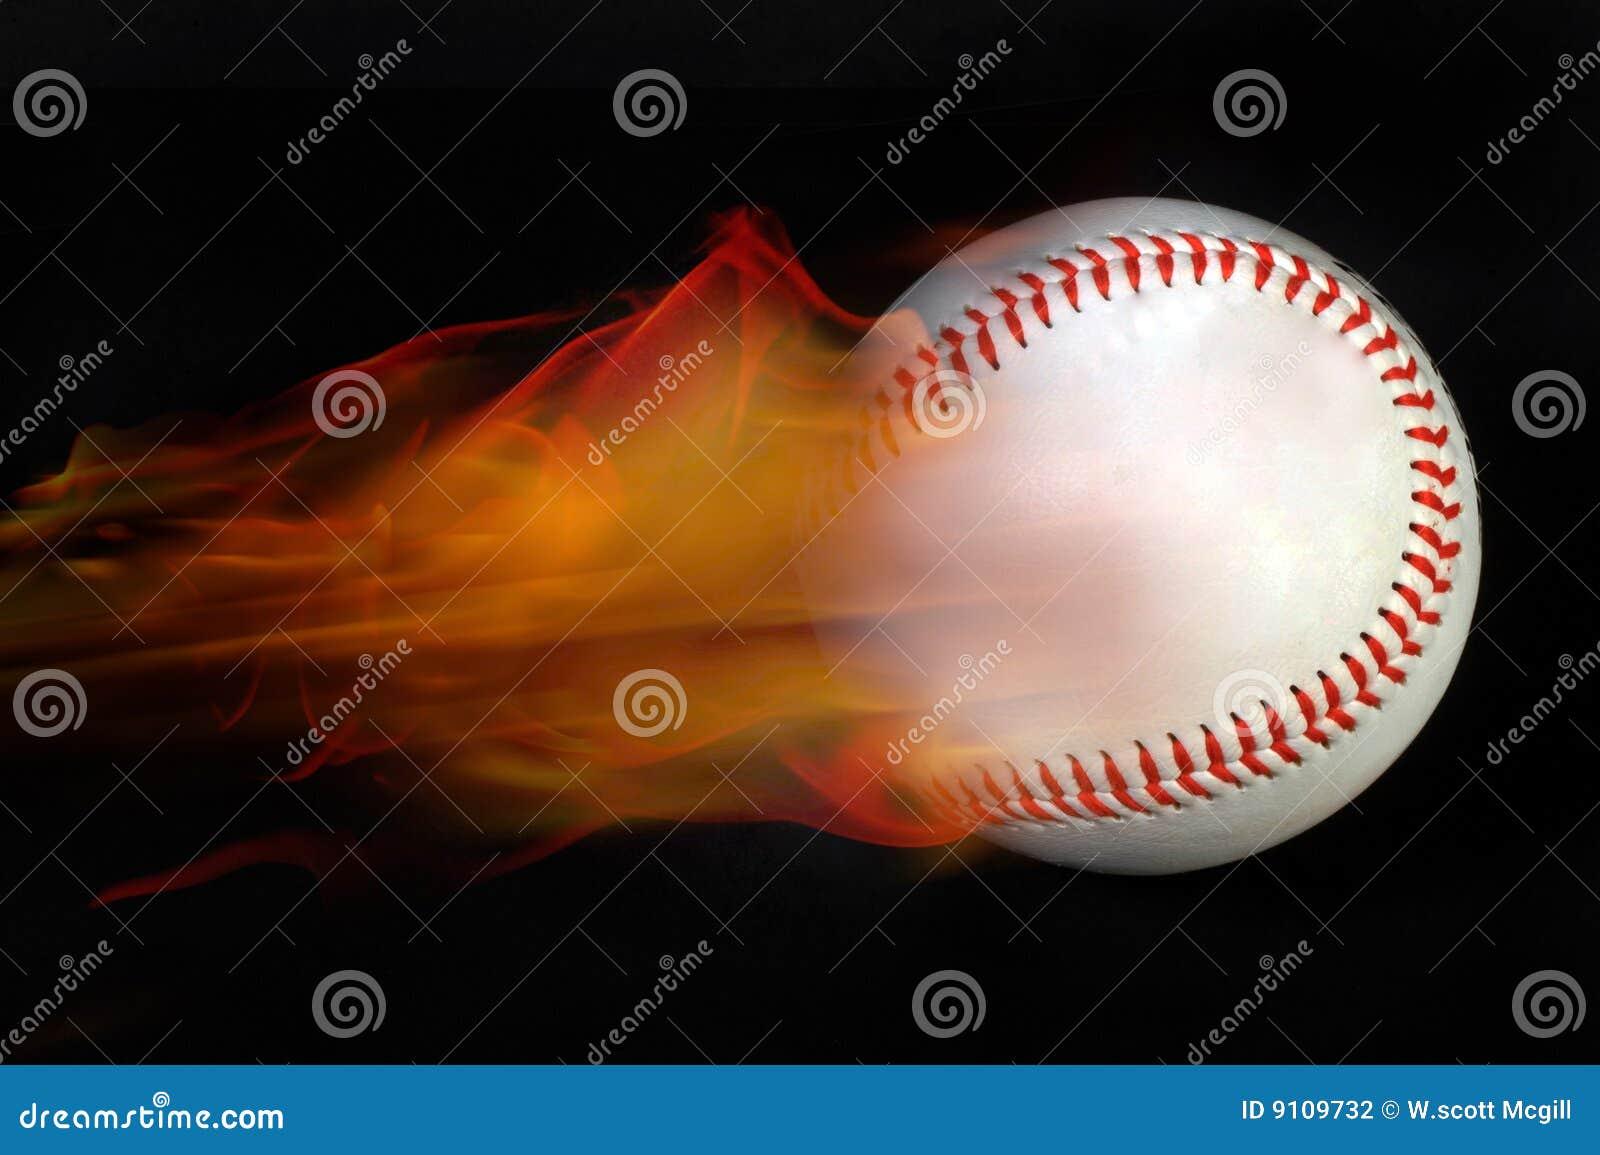 Baseball on fire